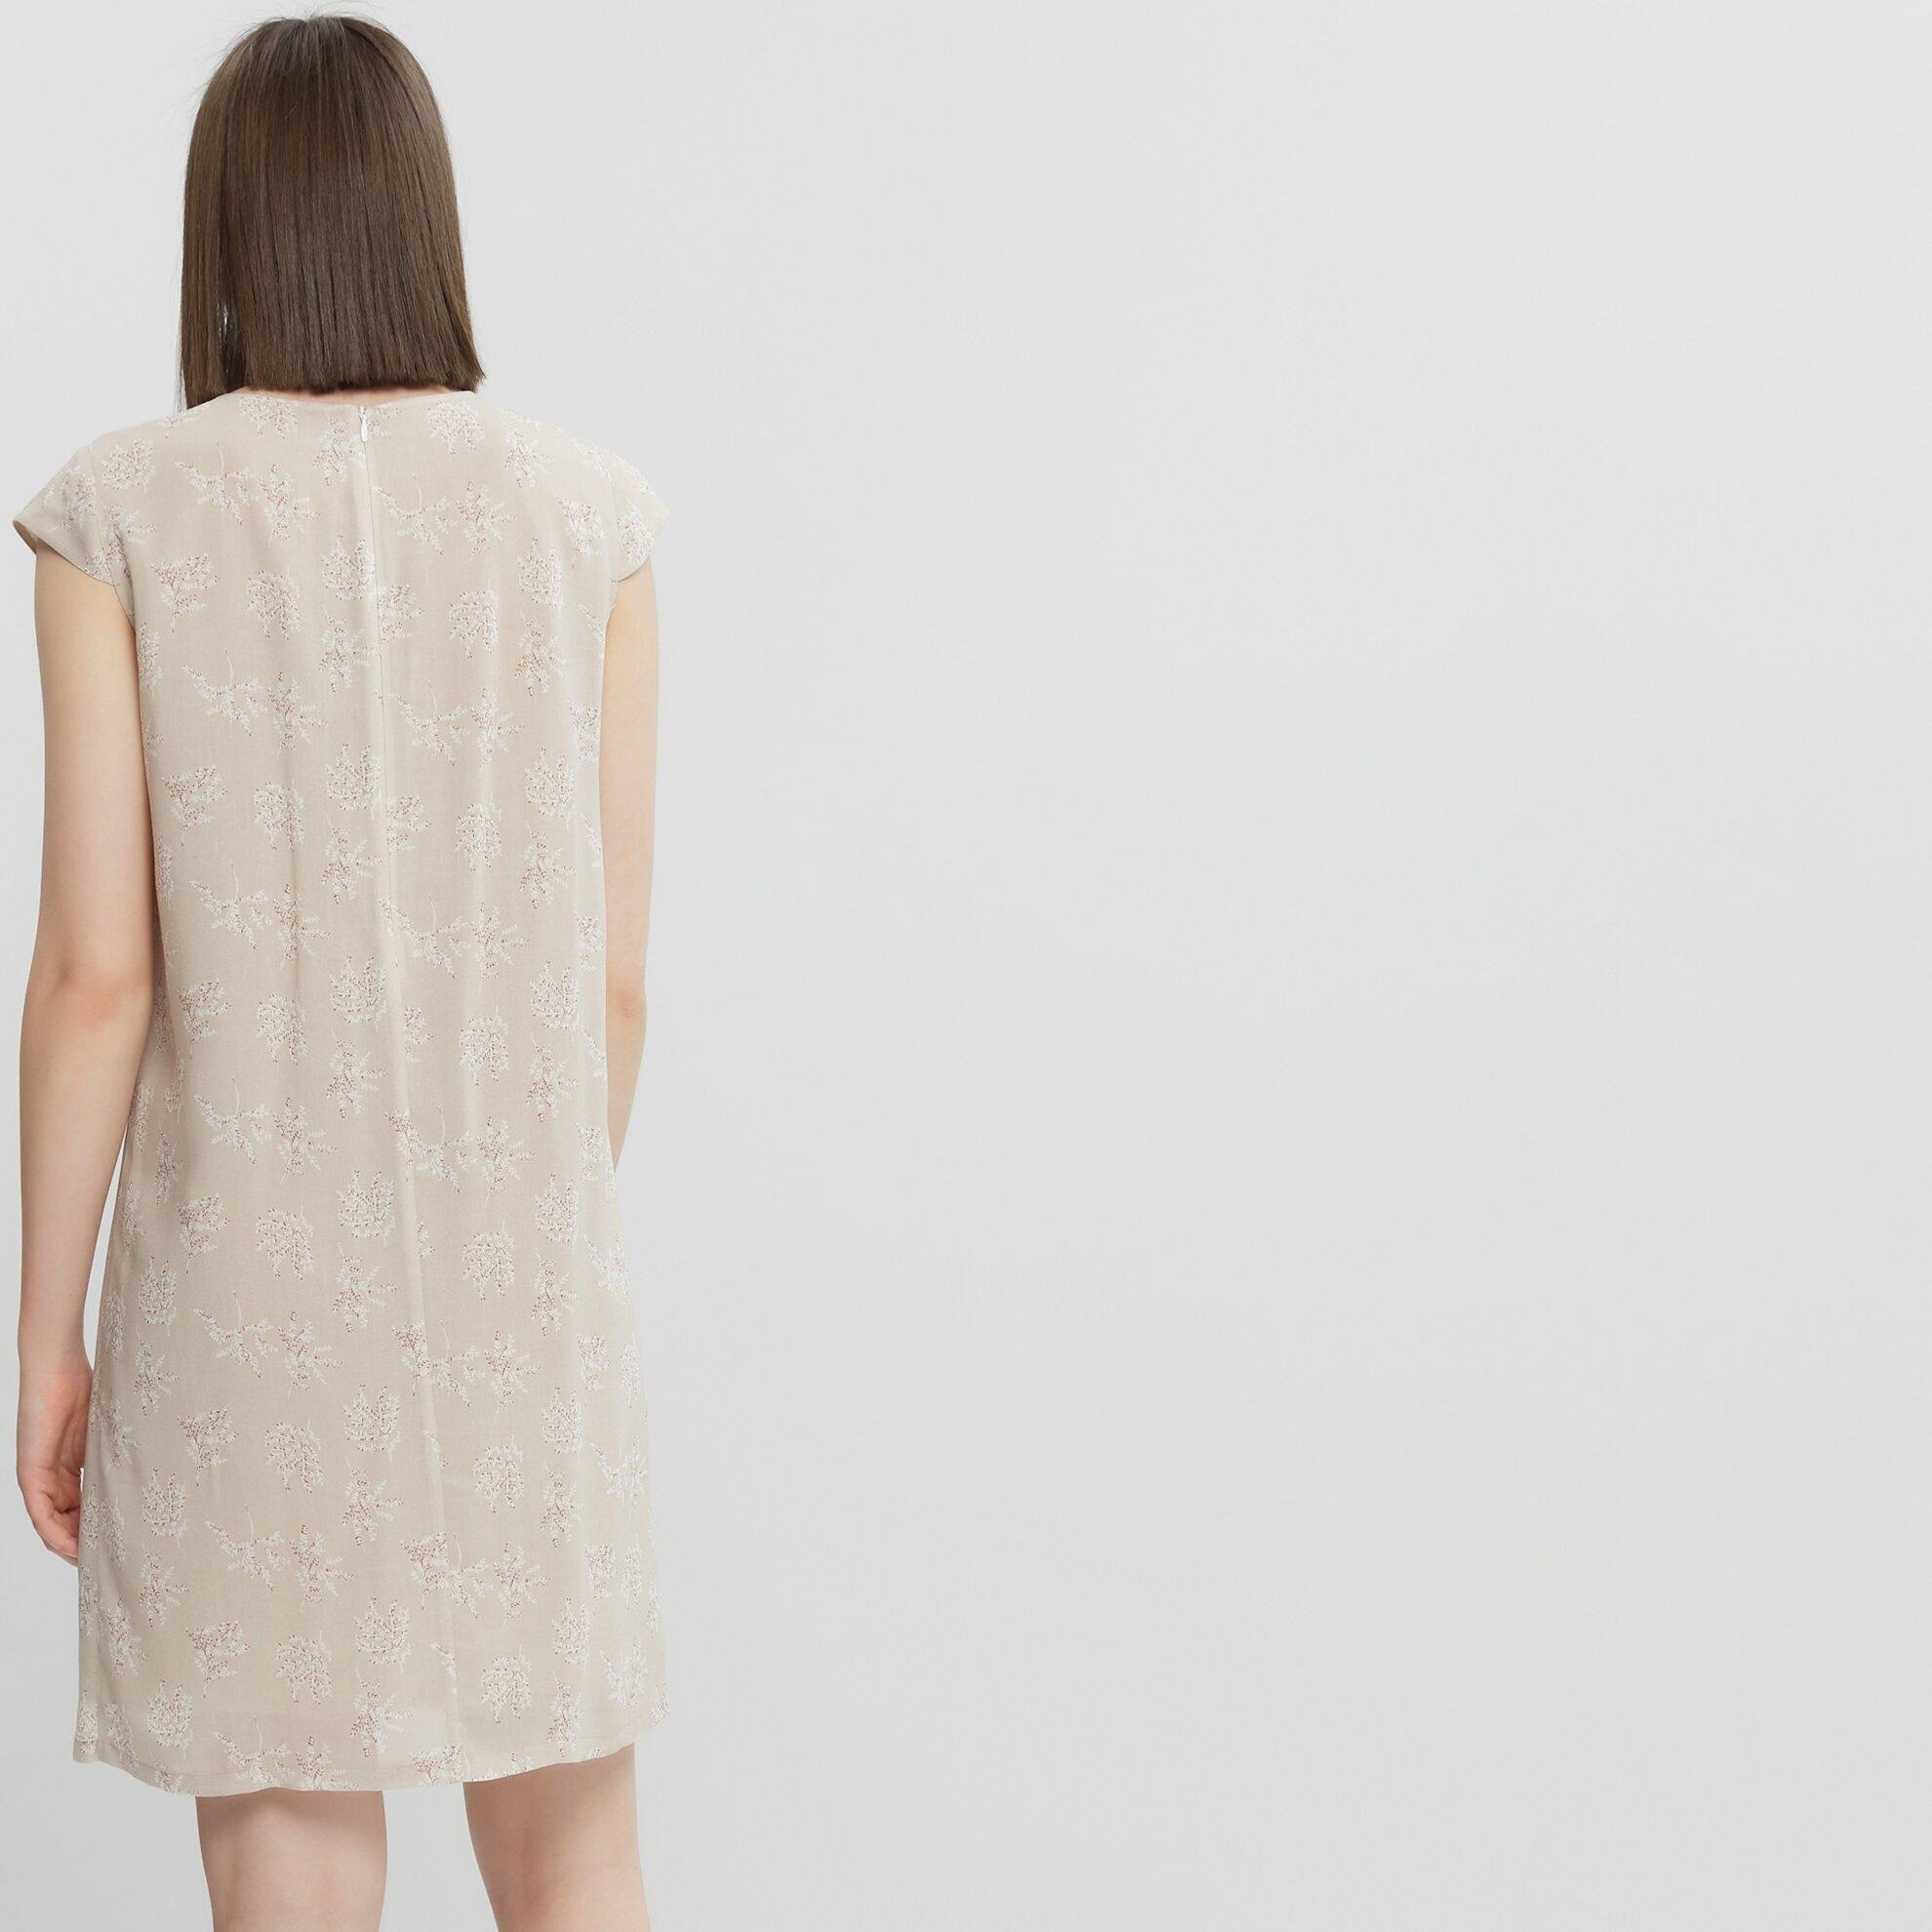 Burgu Detaylı Elbise